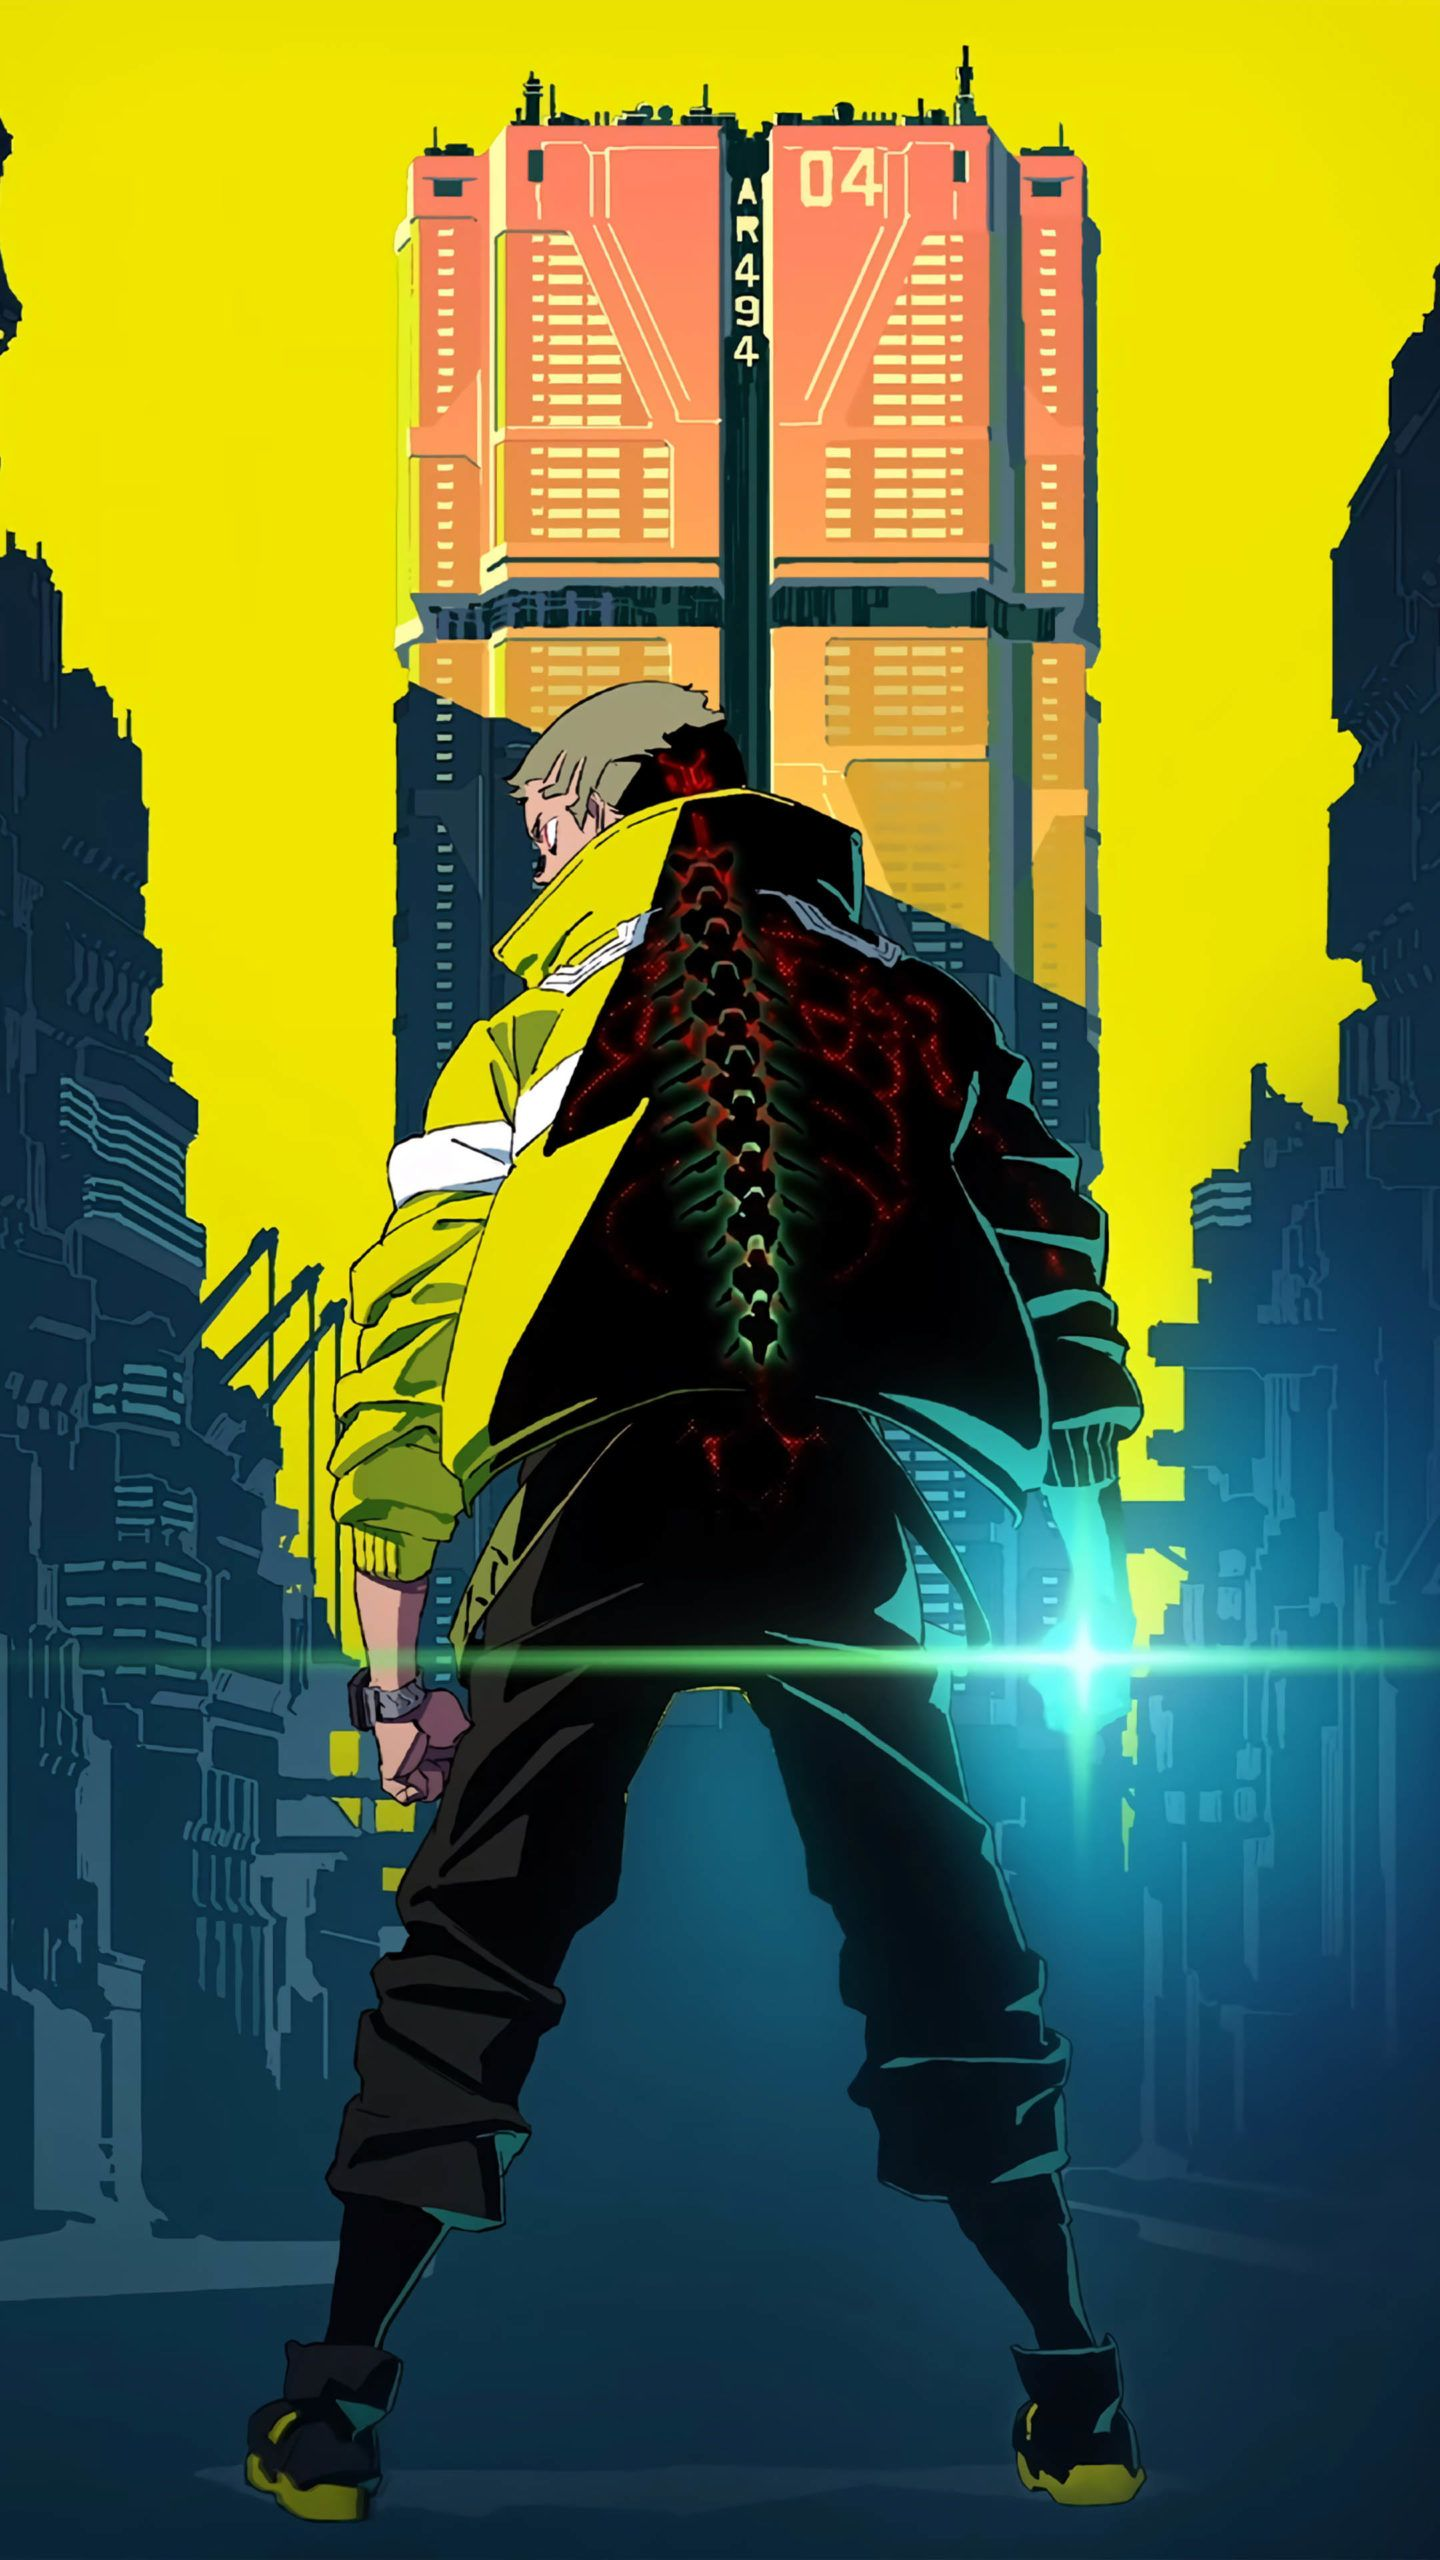 Cyberpunk Edgerunners 4k Ultra Hd Mobile Wallpaper Cyberpunk Cyberpunk 2077 Cyberpunk Aesthetic